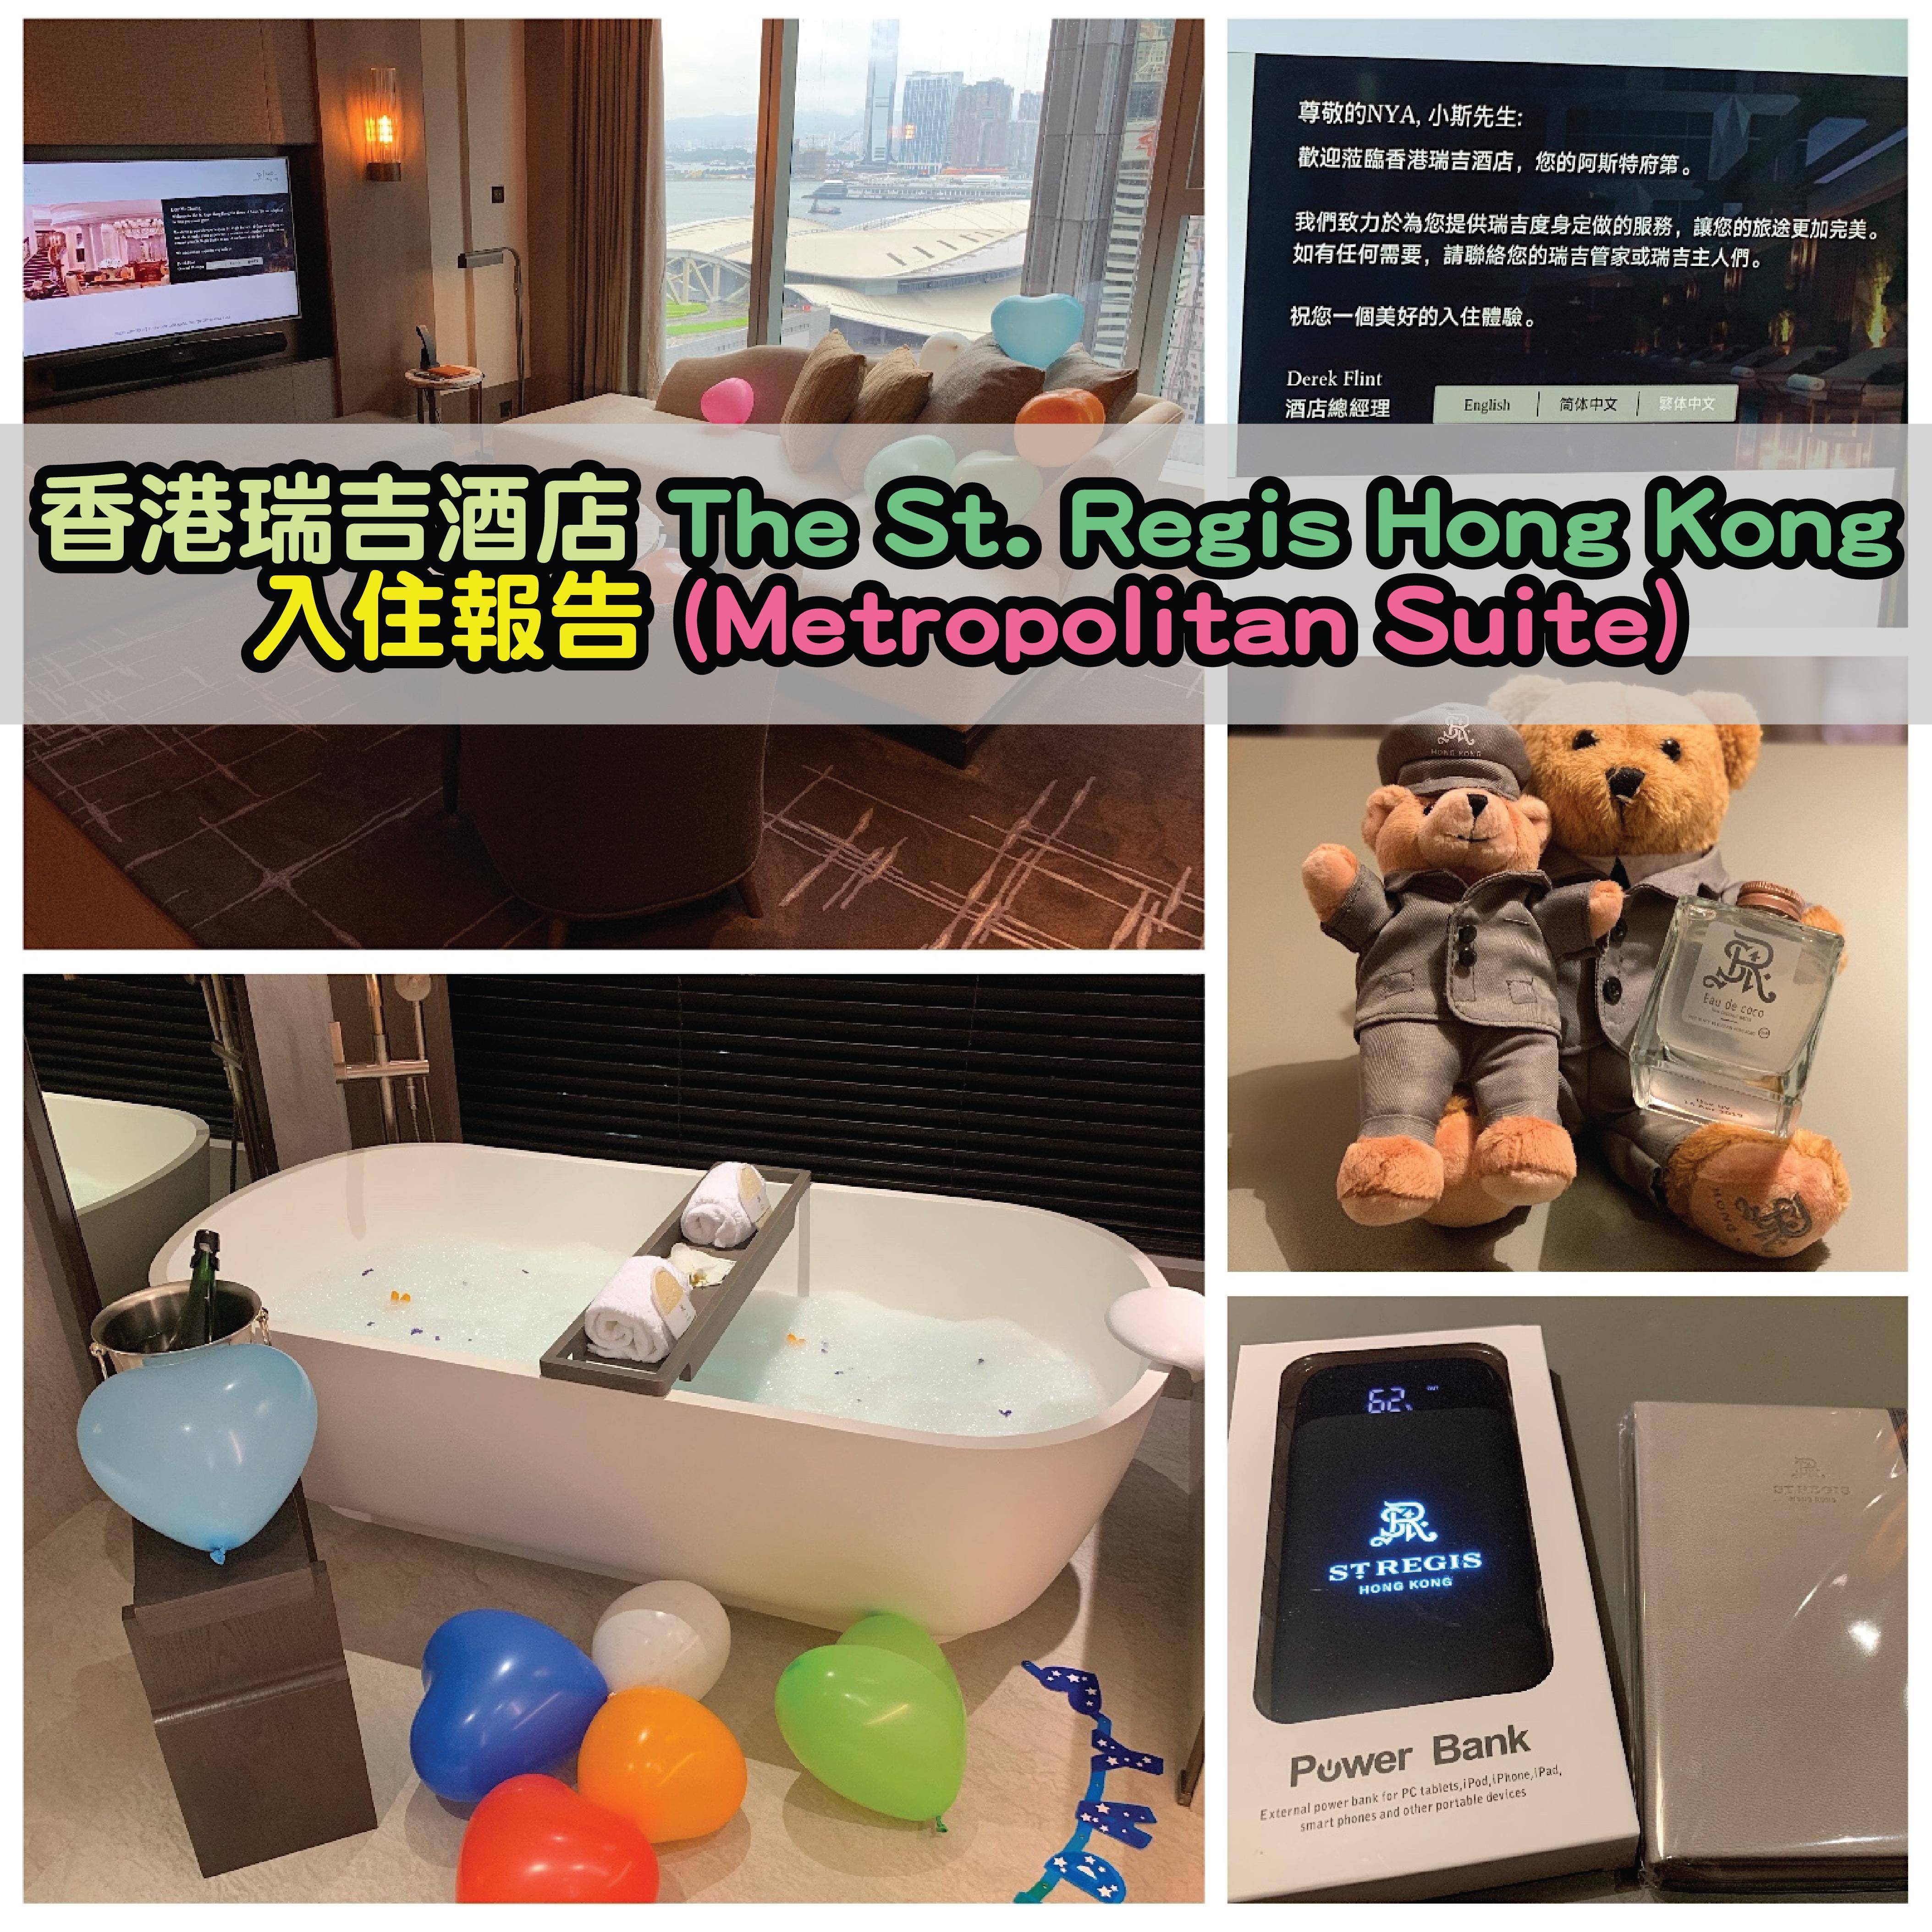 香港瑞吉酒店 The St. Regis Hong Kong 入住報告 (Metropolitan Suite, 紀念熊仔及充電, Spa 及 Swimming Pool)